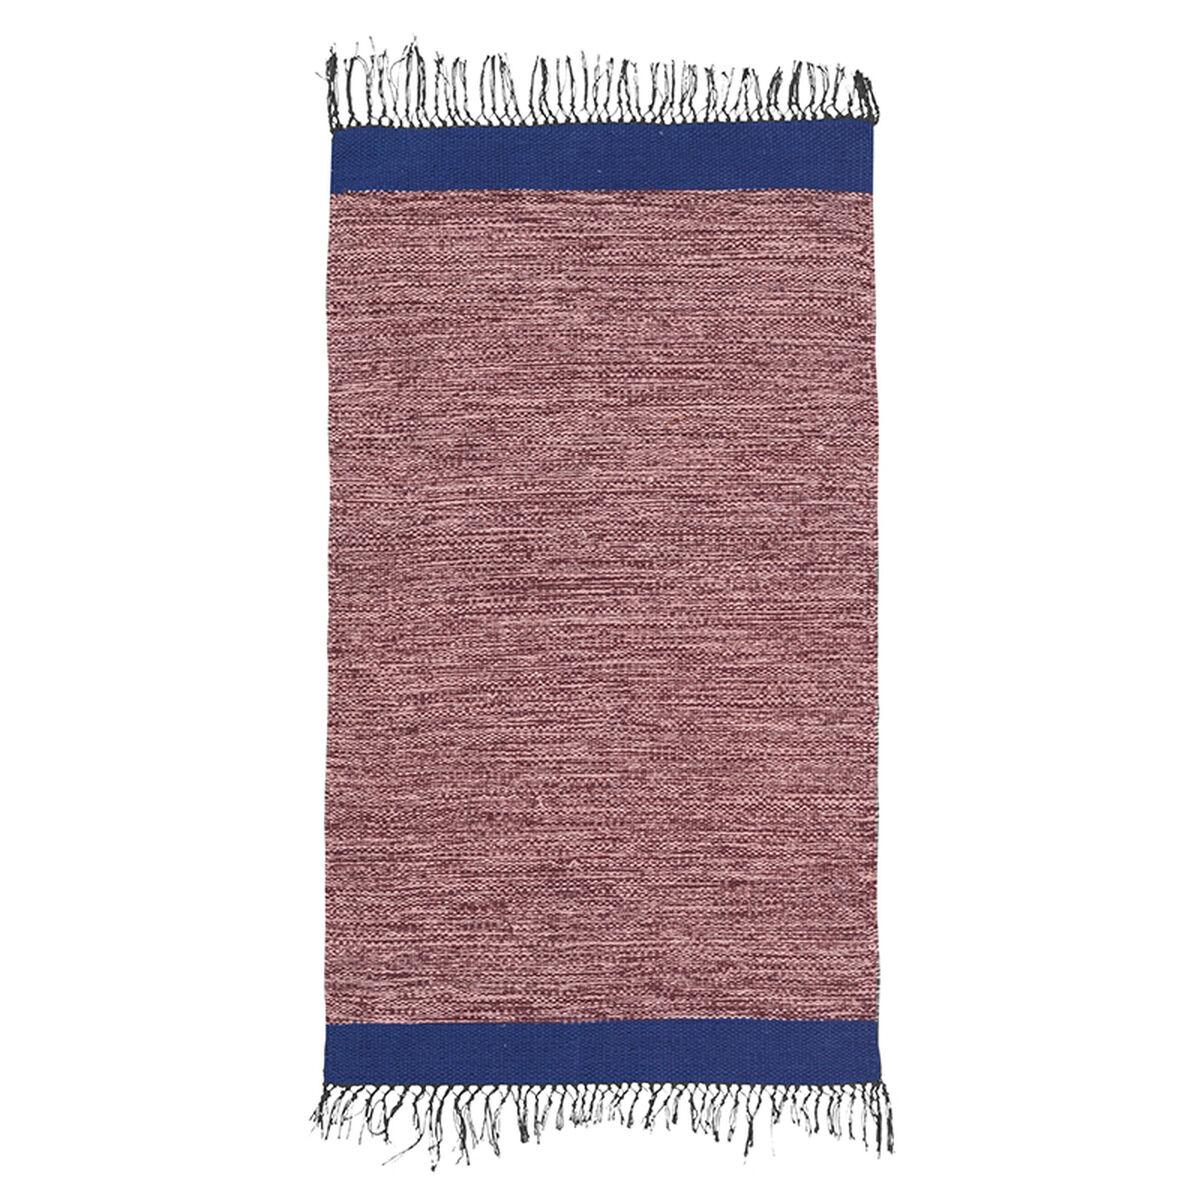 Ferm Living Melange kylpyhuoneen matto, roosa-sininen